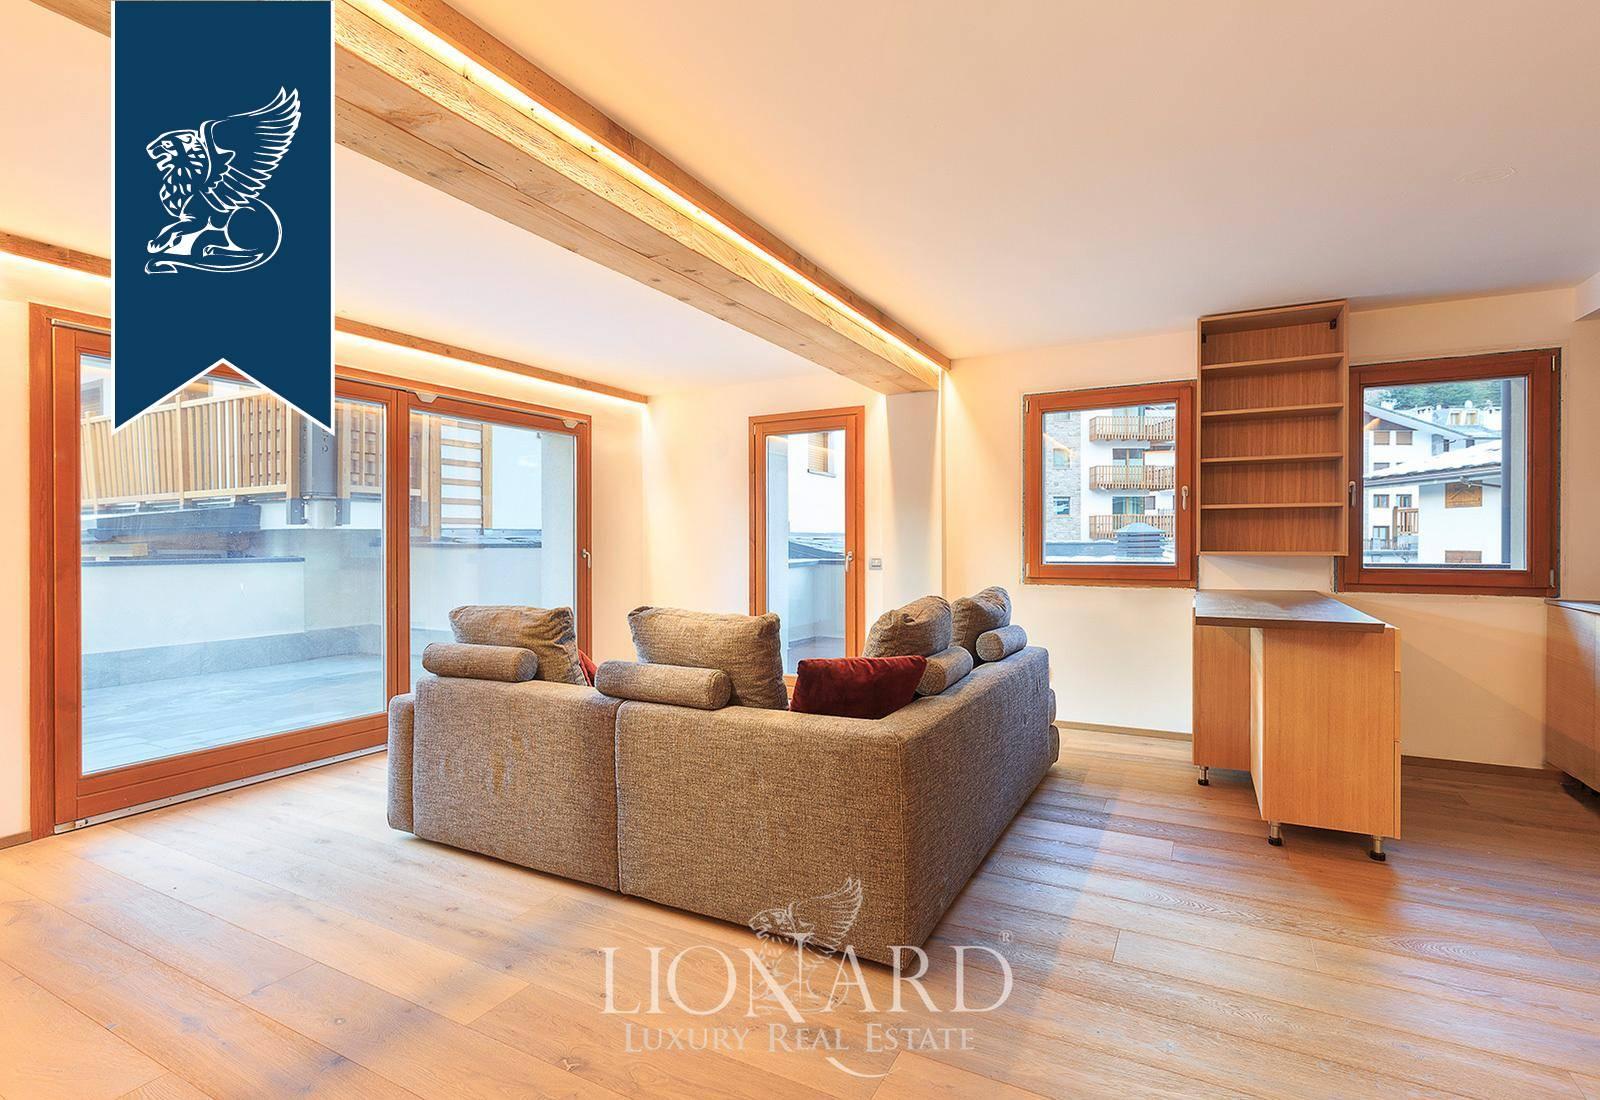 Appartamento in Vendita a Courmayeur: 0 locali, 150 mq - Foto 9